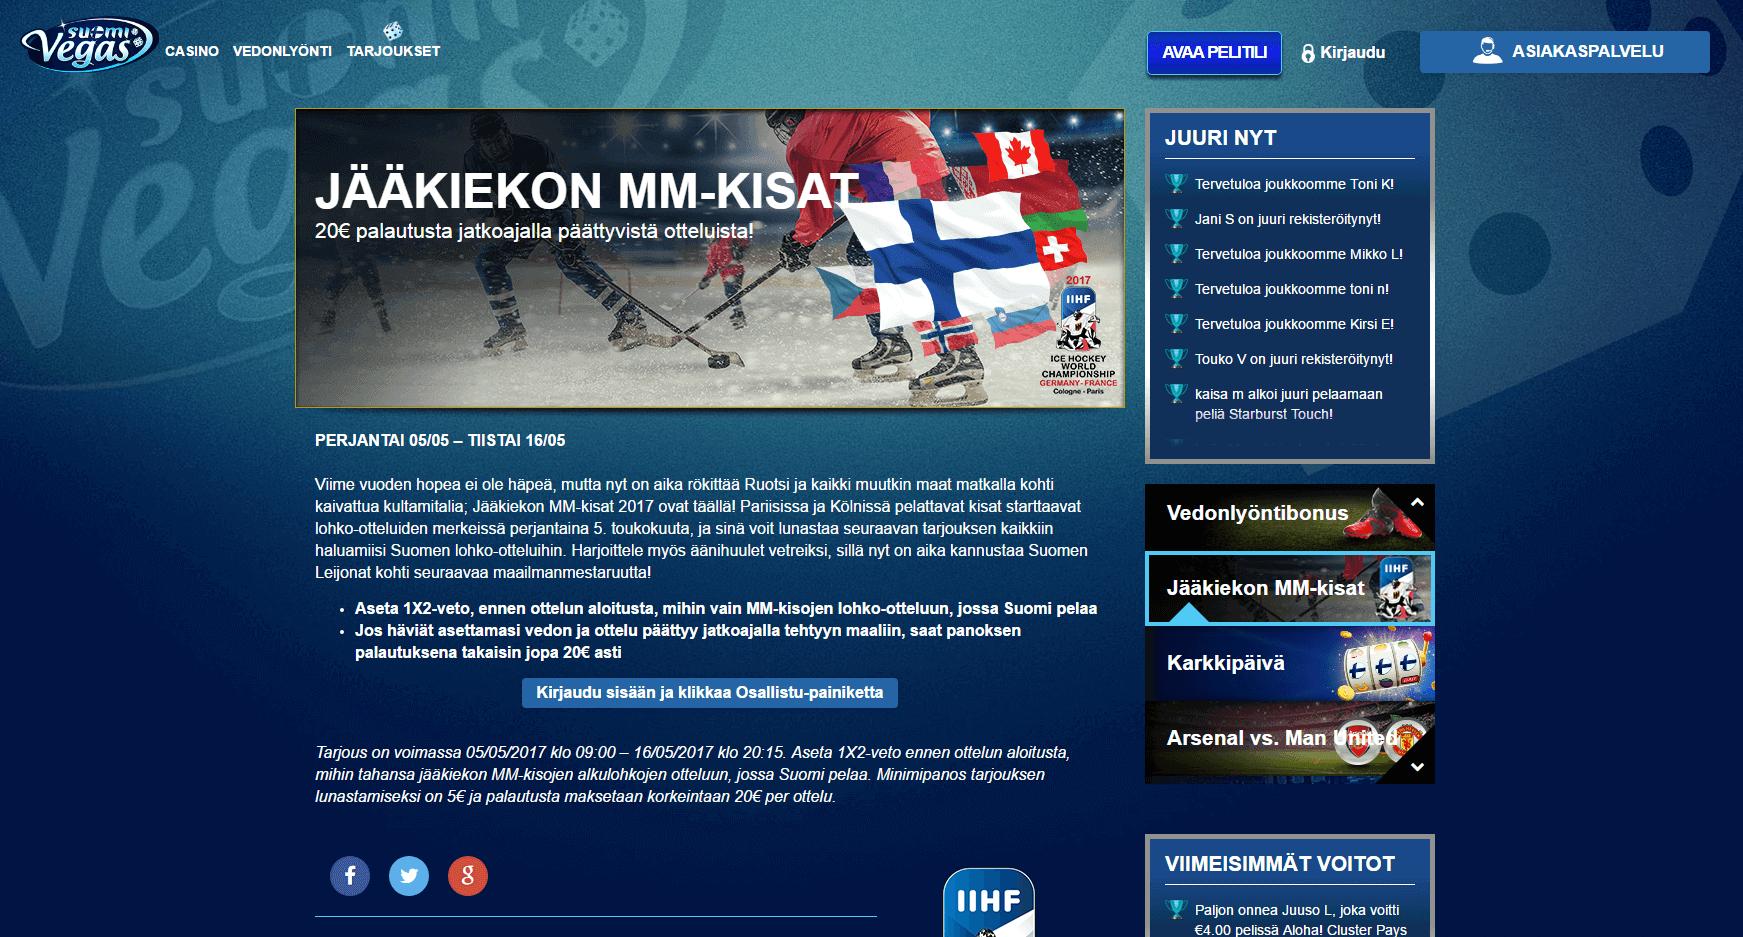 Suomivegas Jääkiekon MM-kisa kampanja